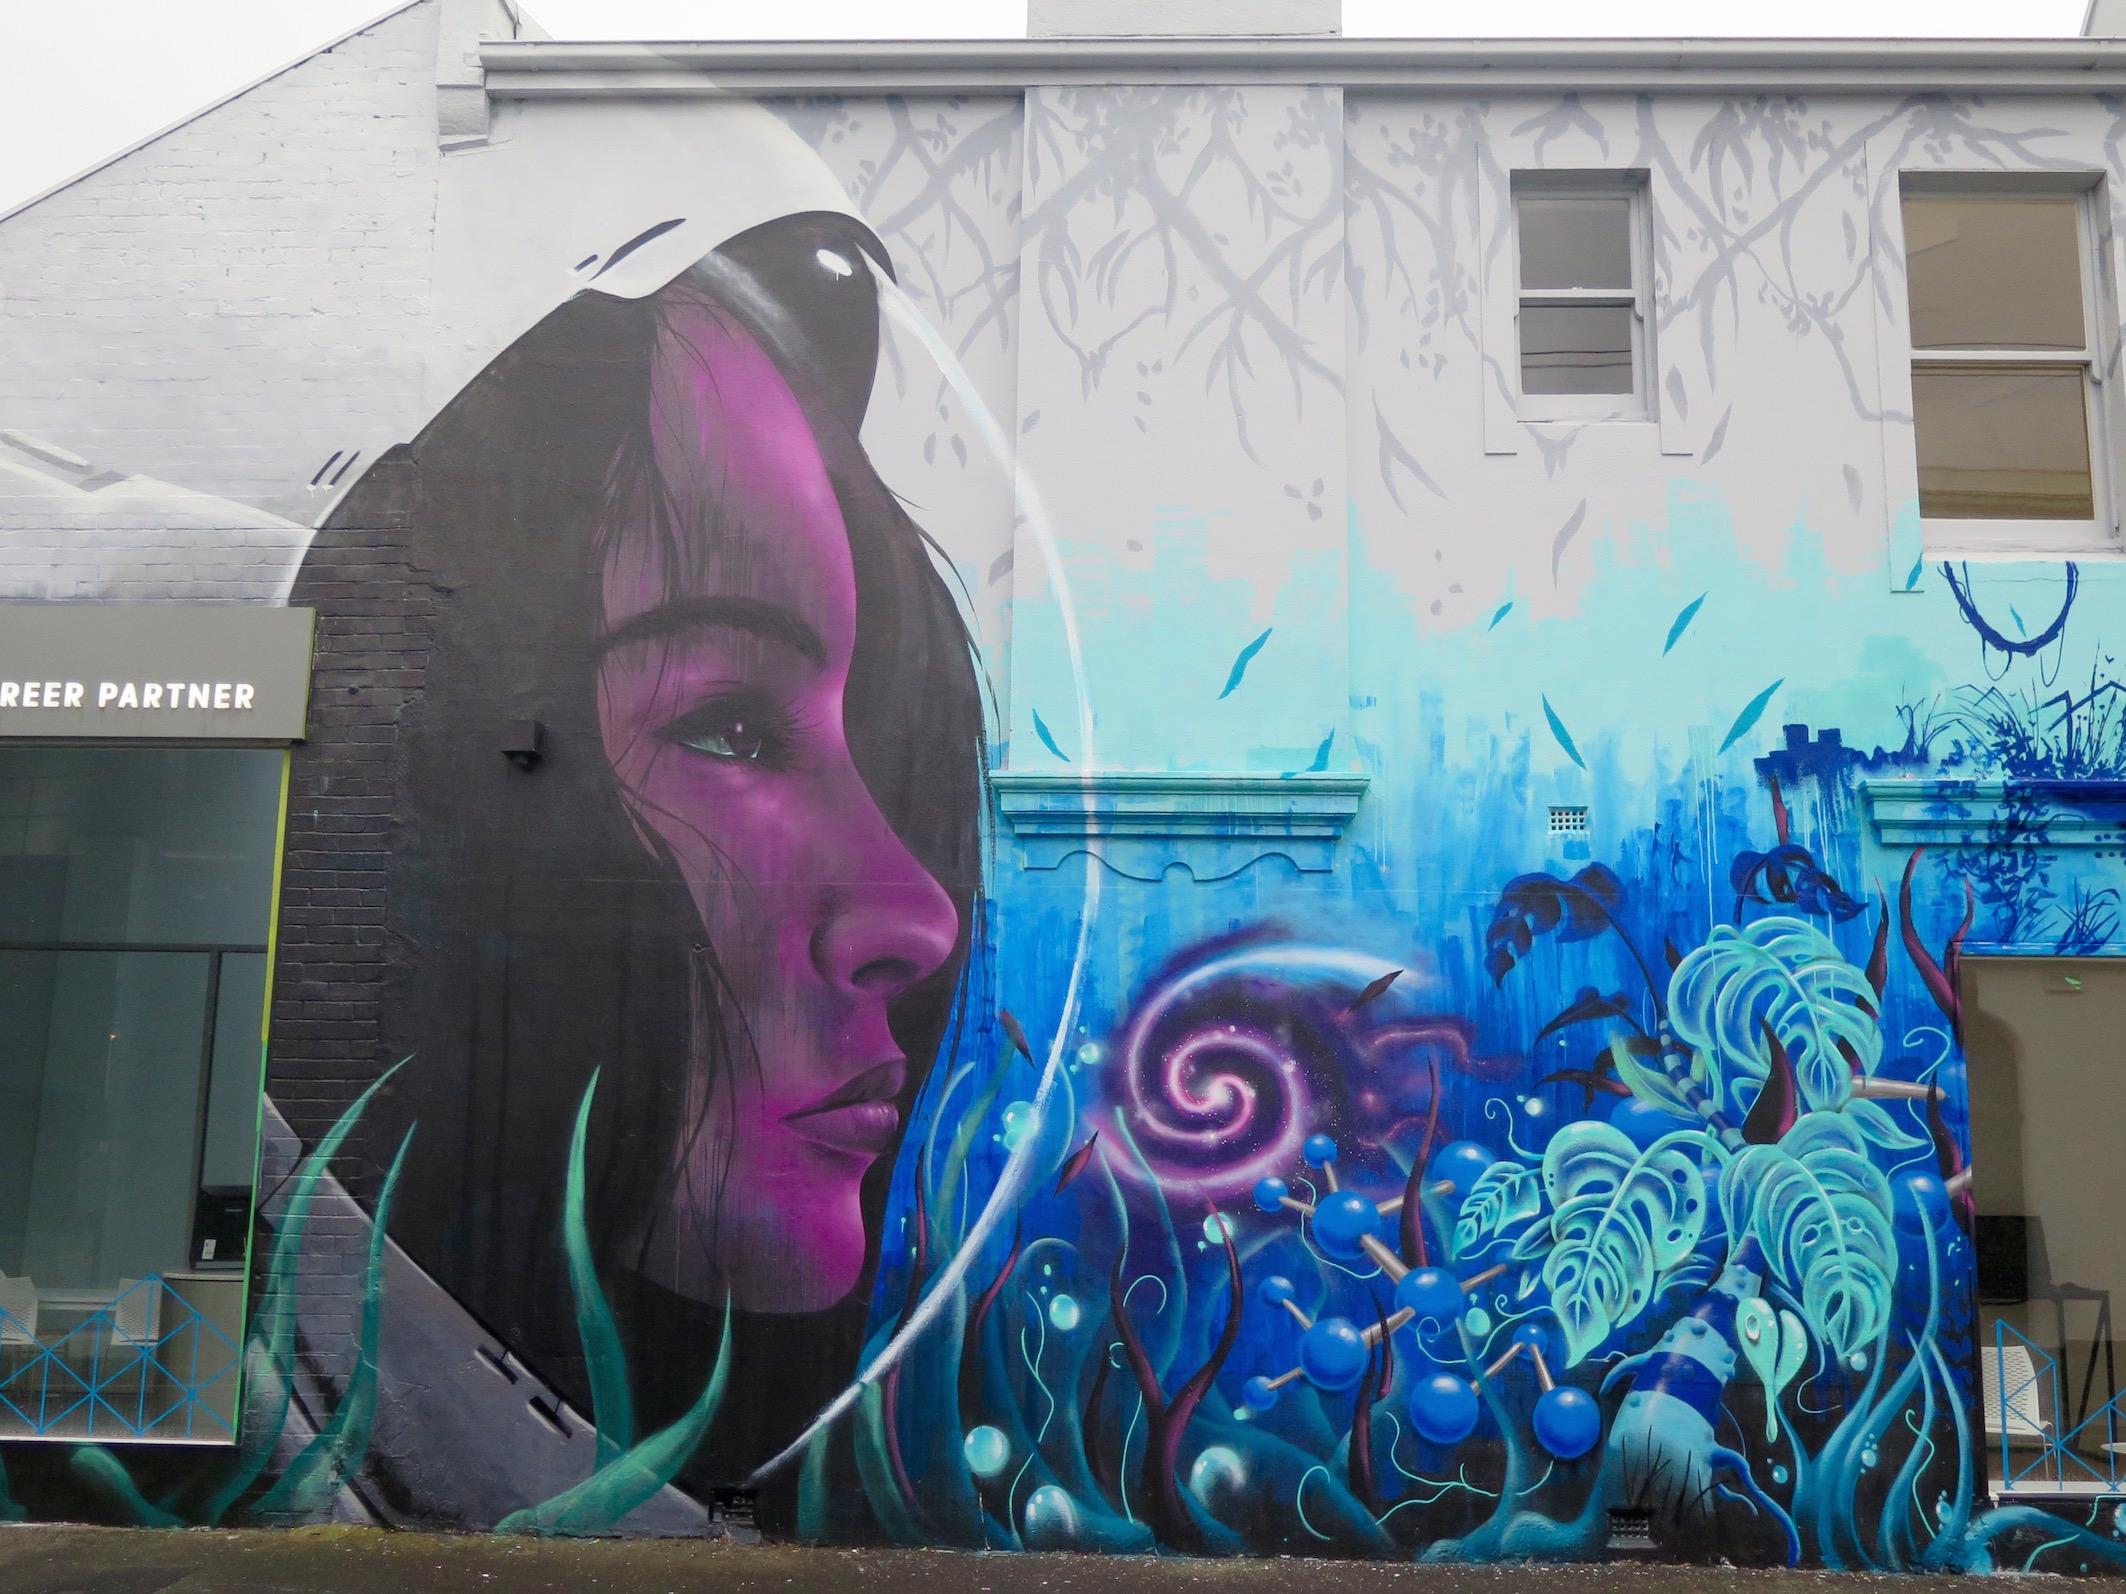 deansunshine_landofsunshine_melbourne_streetart_graffiti_melb-polytechnic-makatron-cam_scale-3